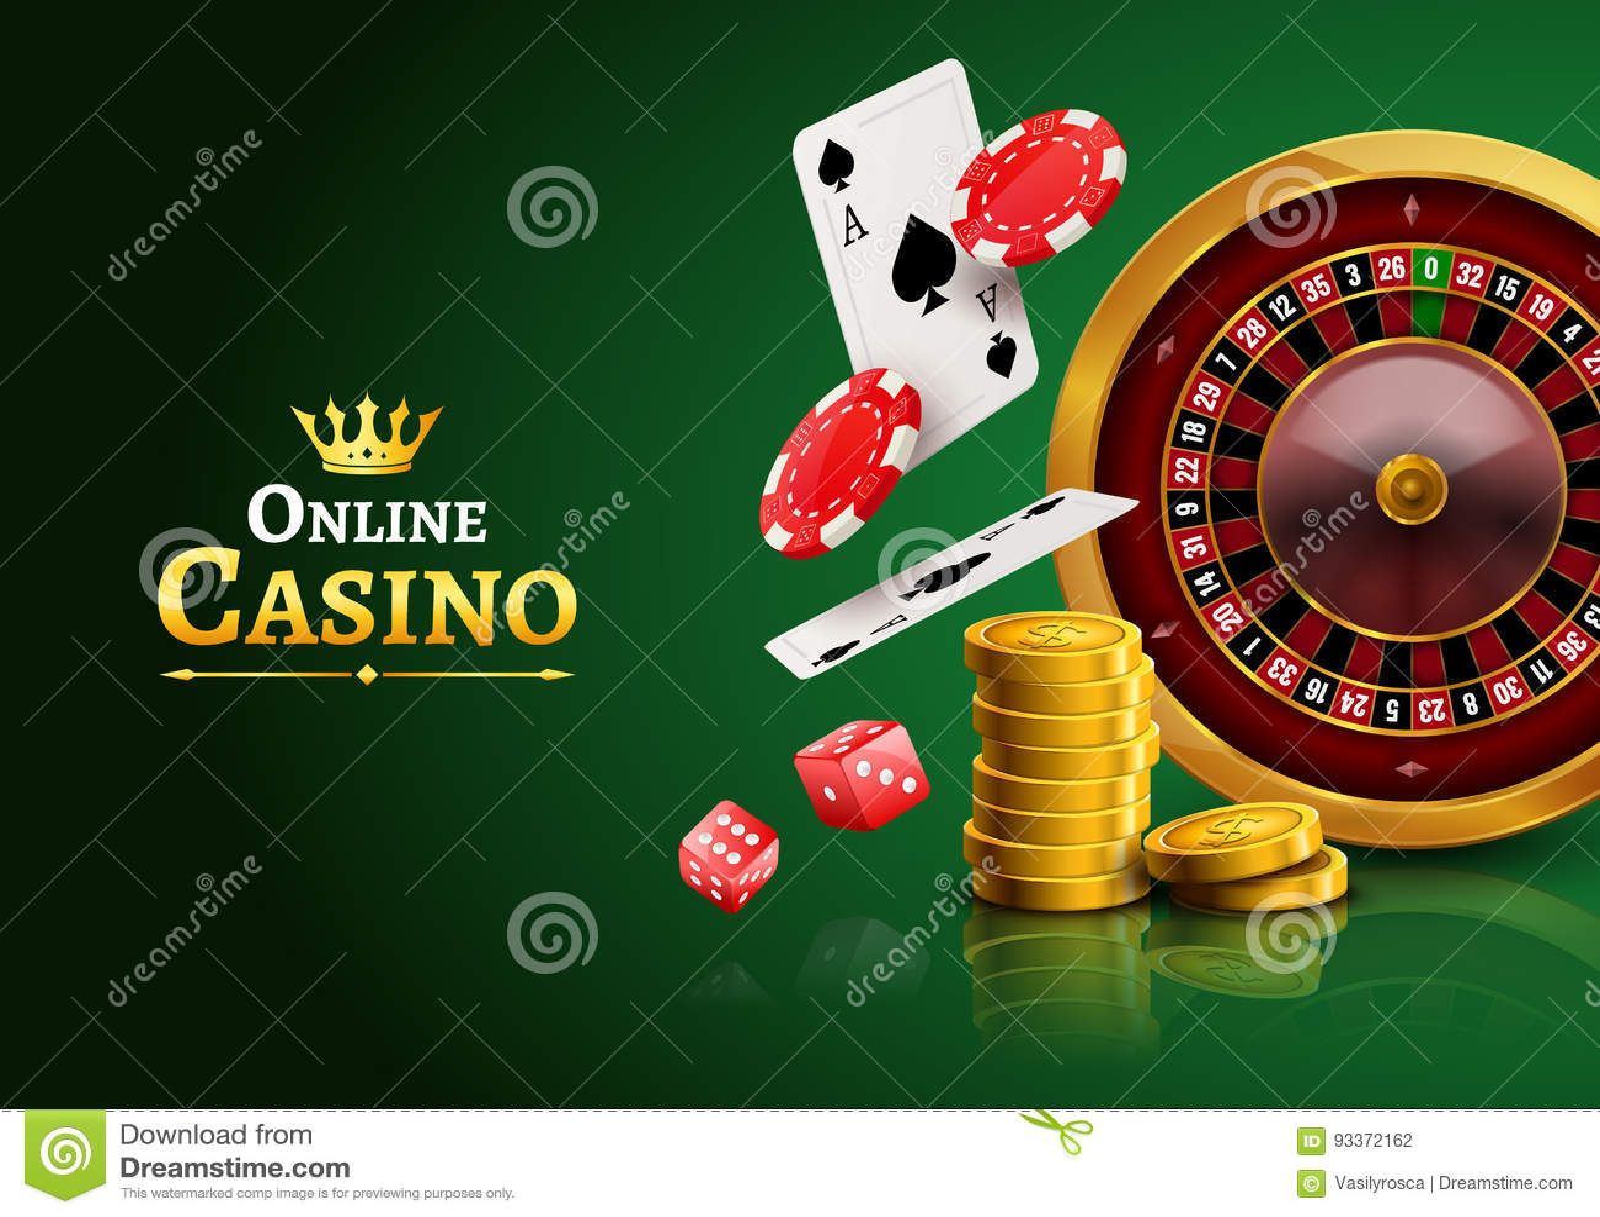 Roulette wheel simulator - 51681